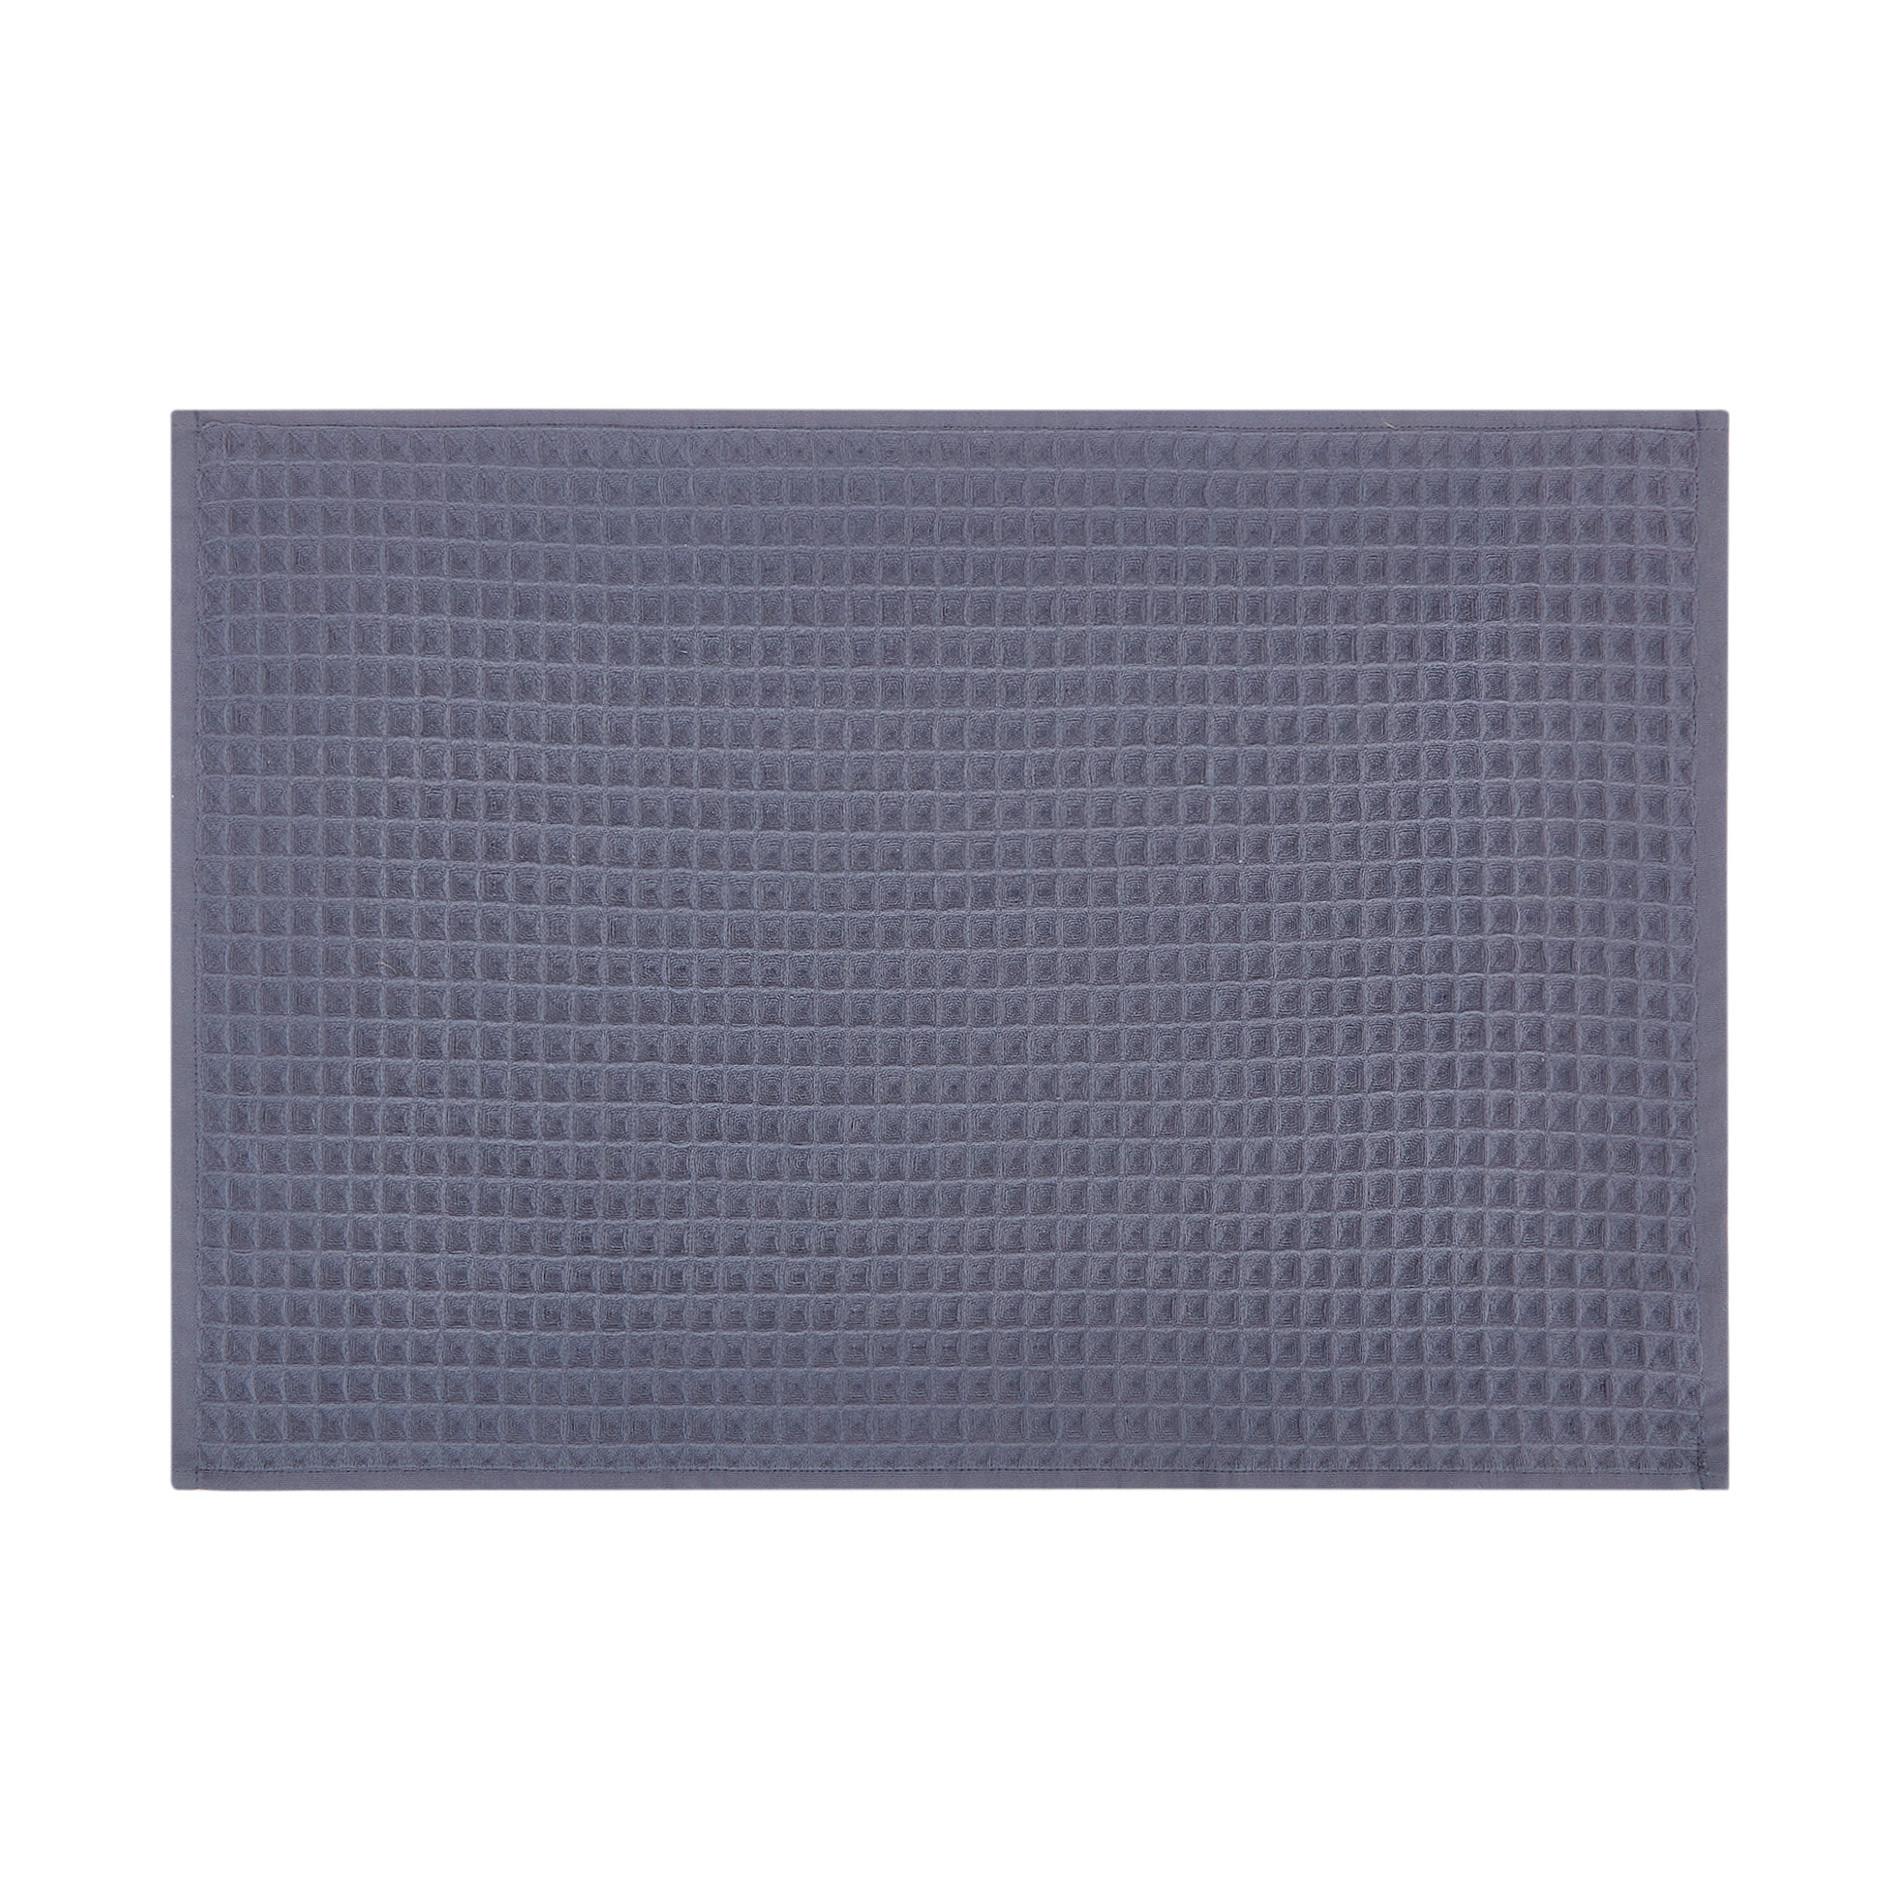 Set 2 asciugamani puro cotone nido d'ape tinta unita, Blu, large image number 1